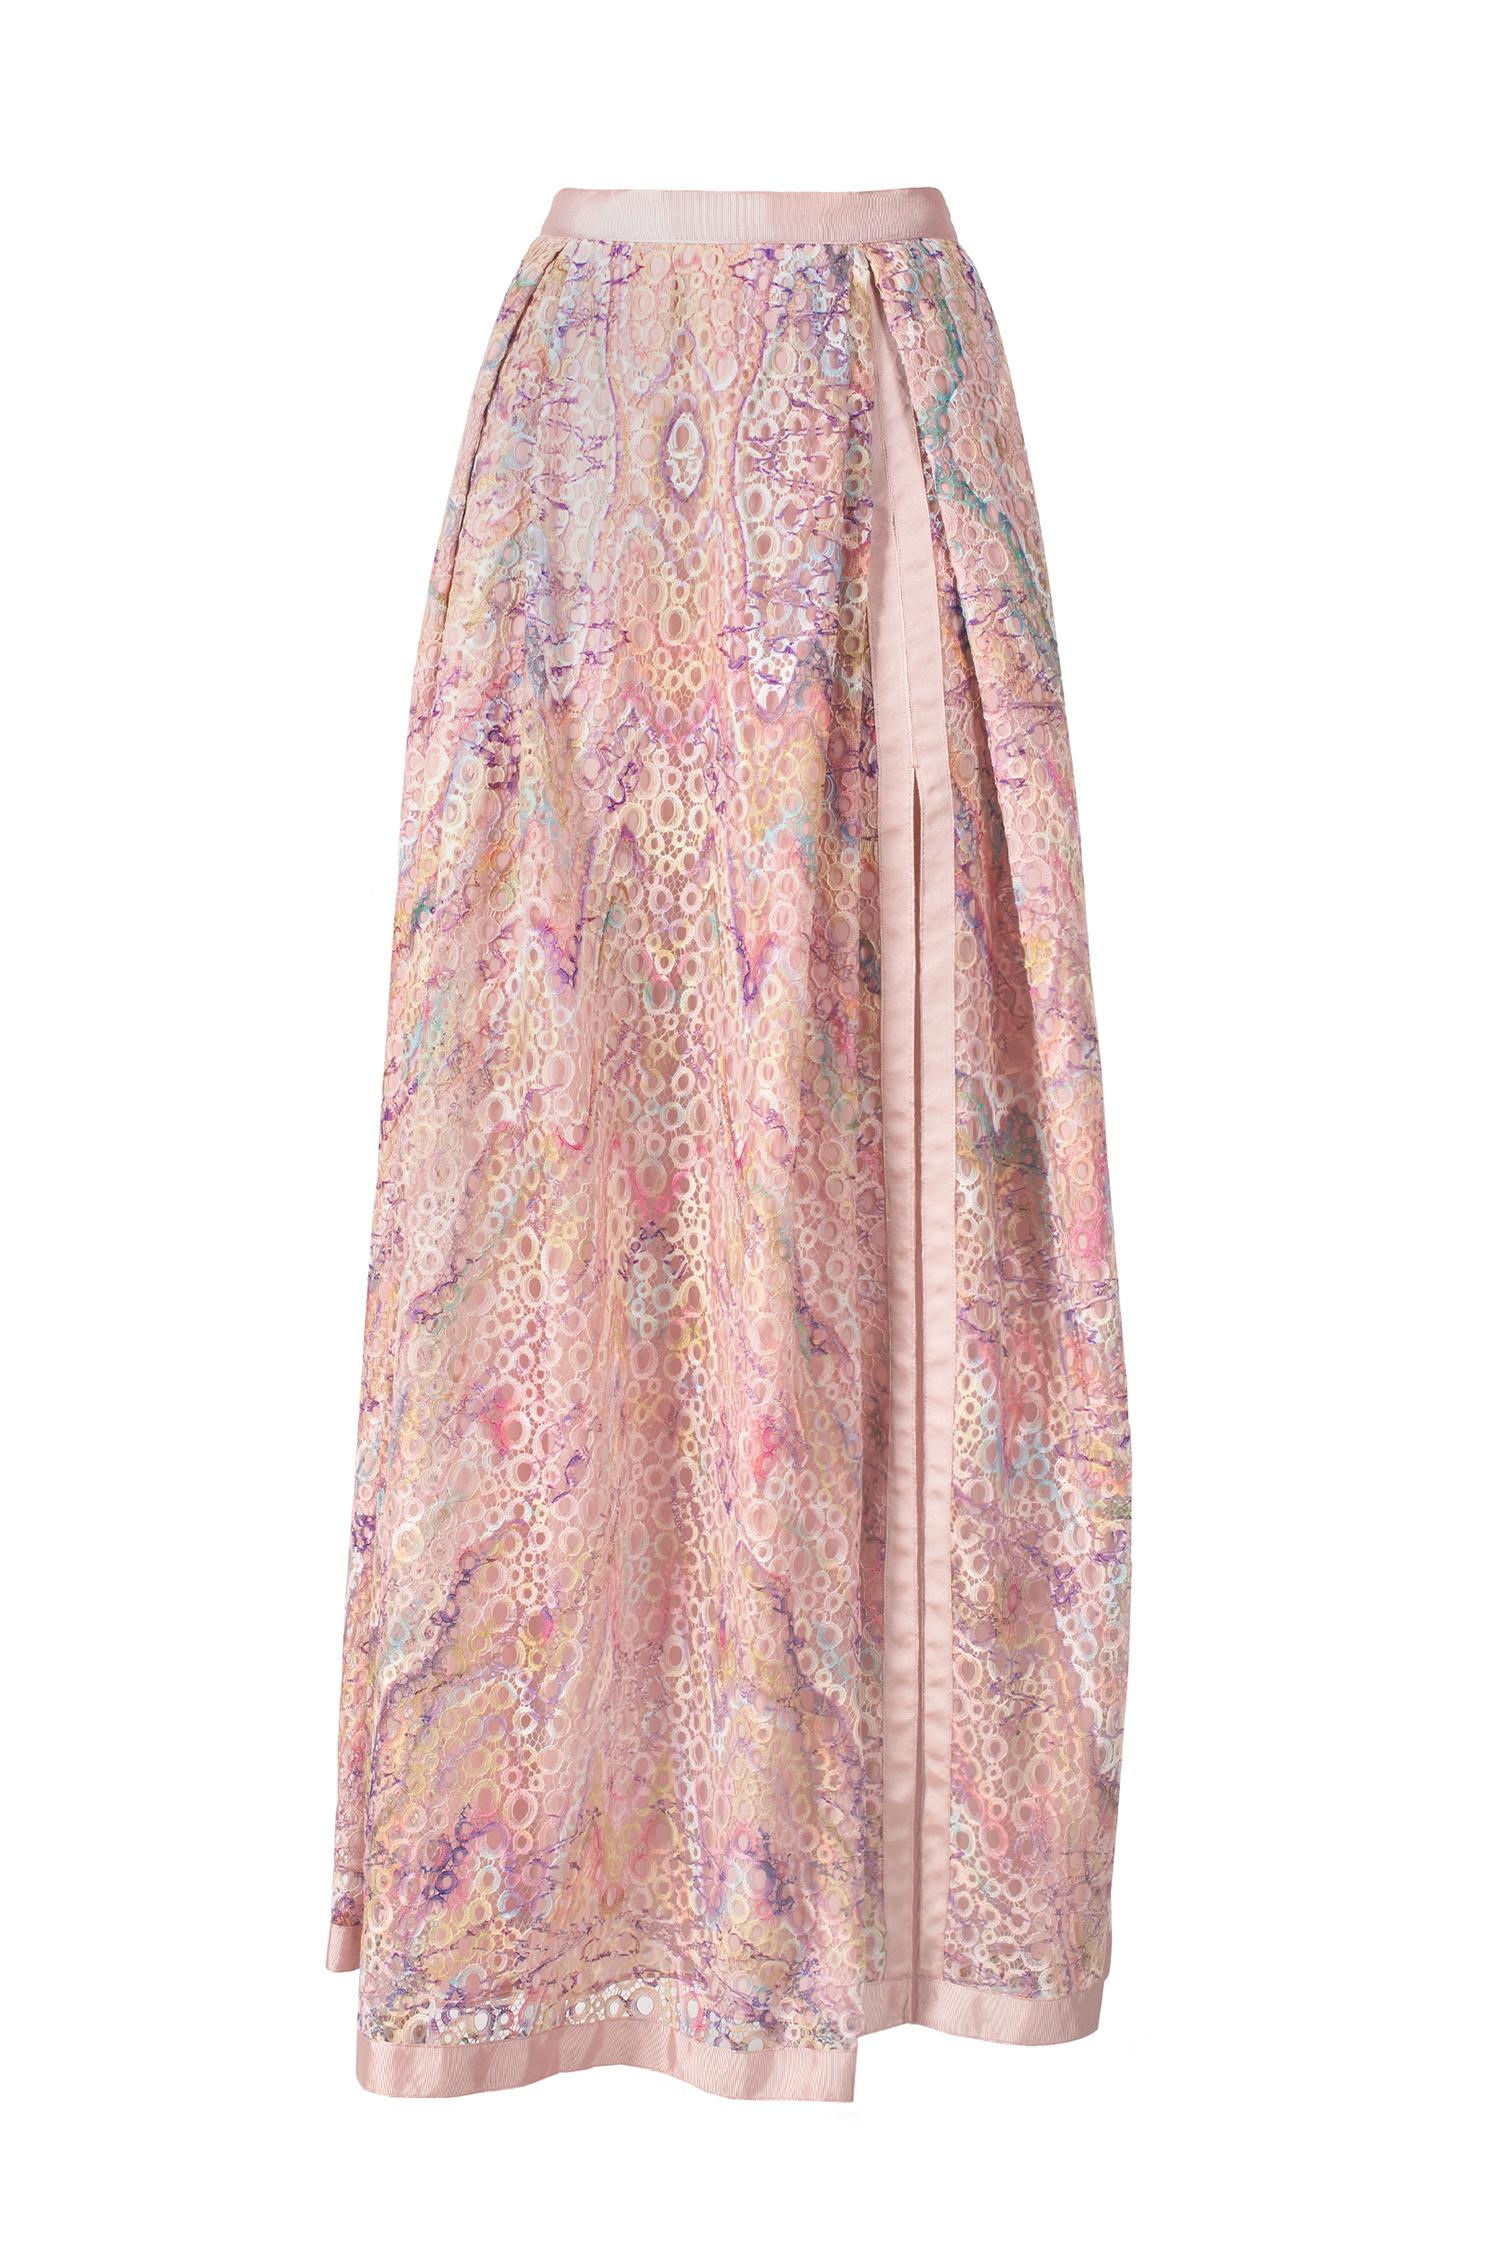 skirt, lace, print, ss21